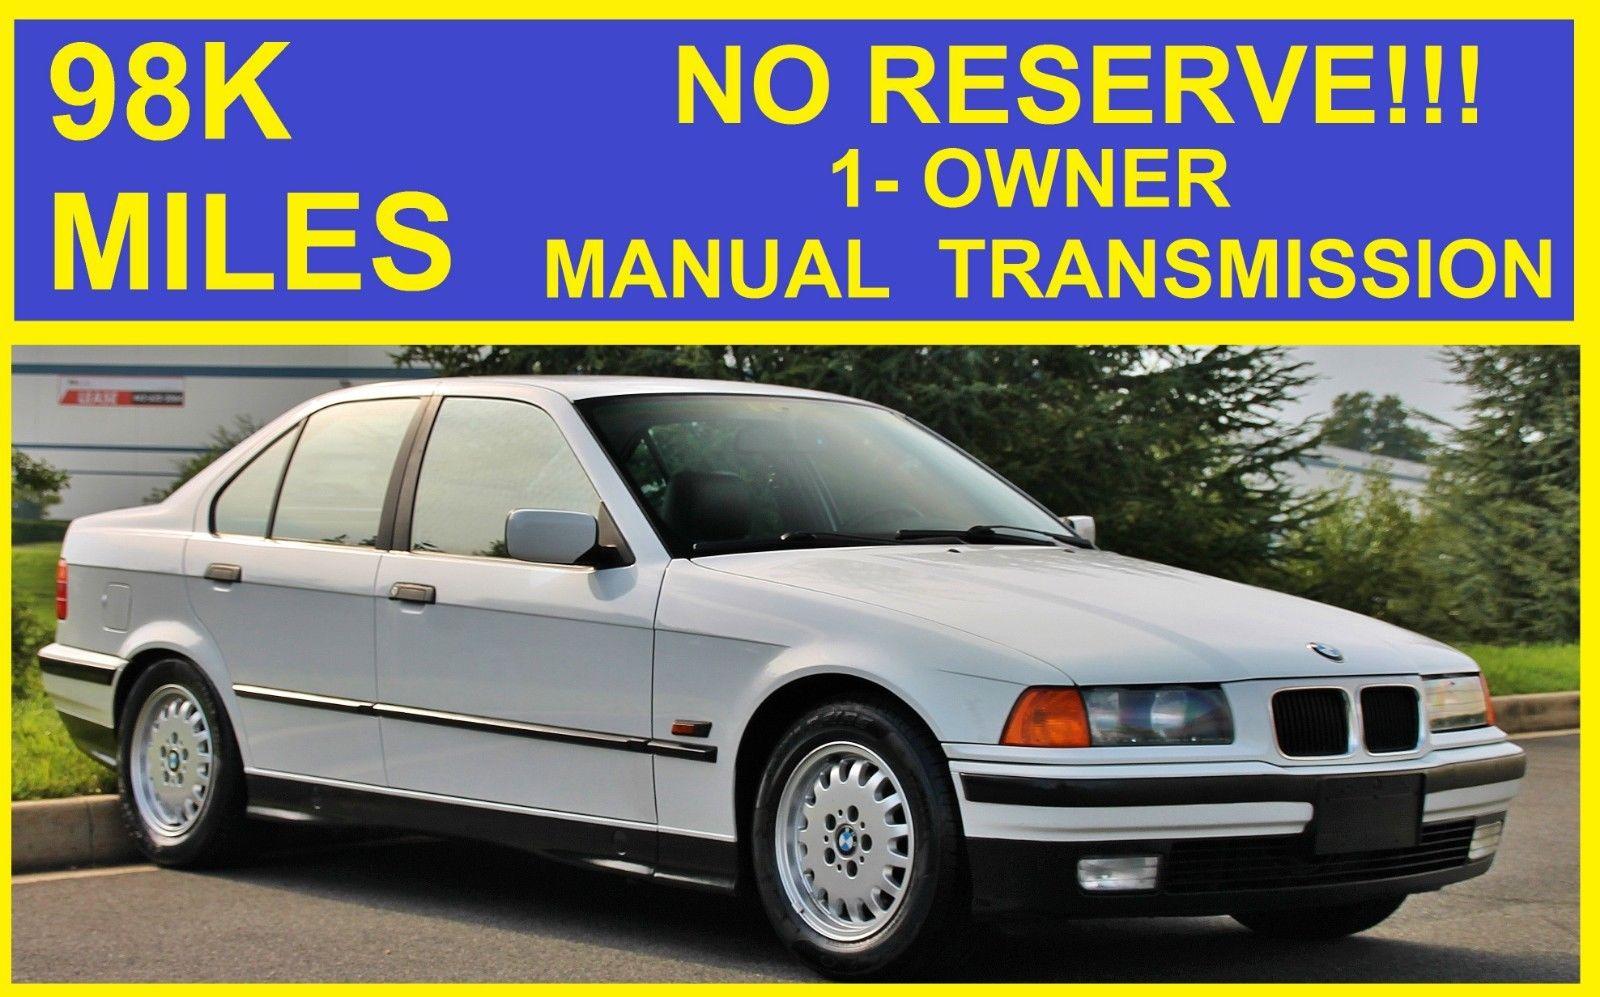 1995 bmw 3 series 325i convertible 5 speed manual transmission.